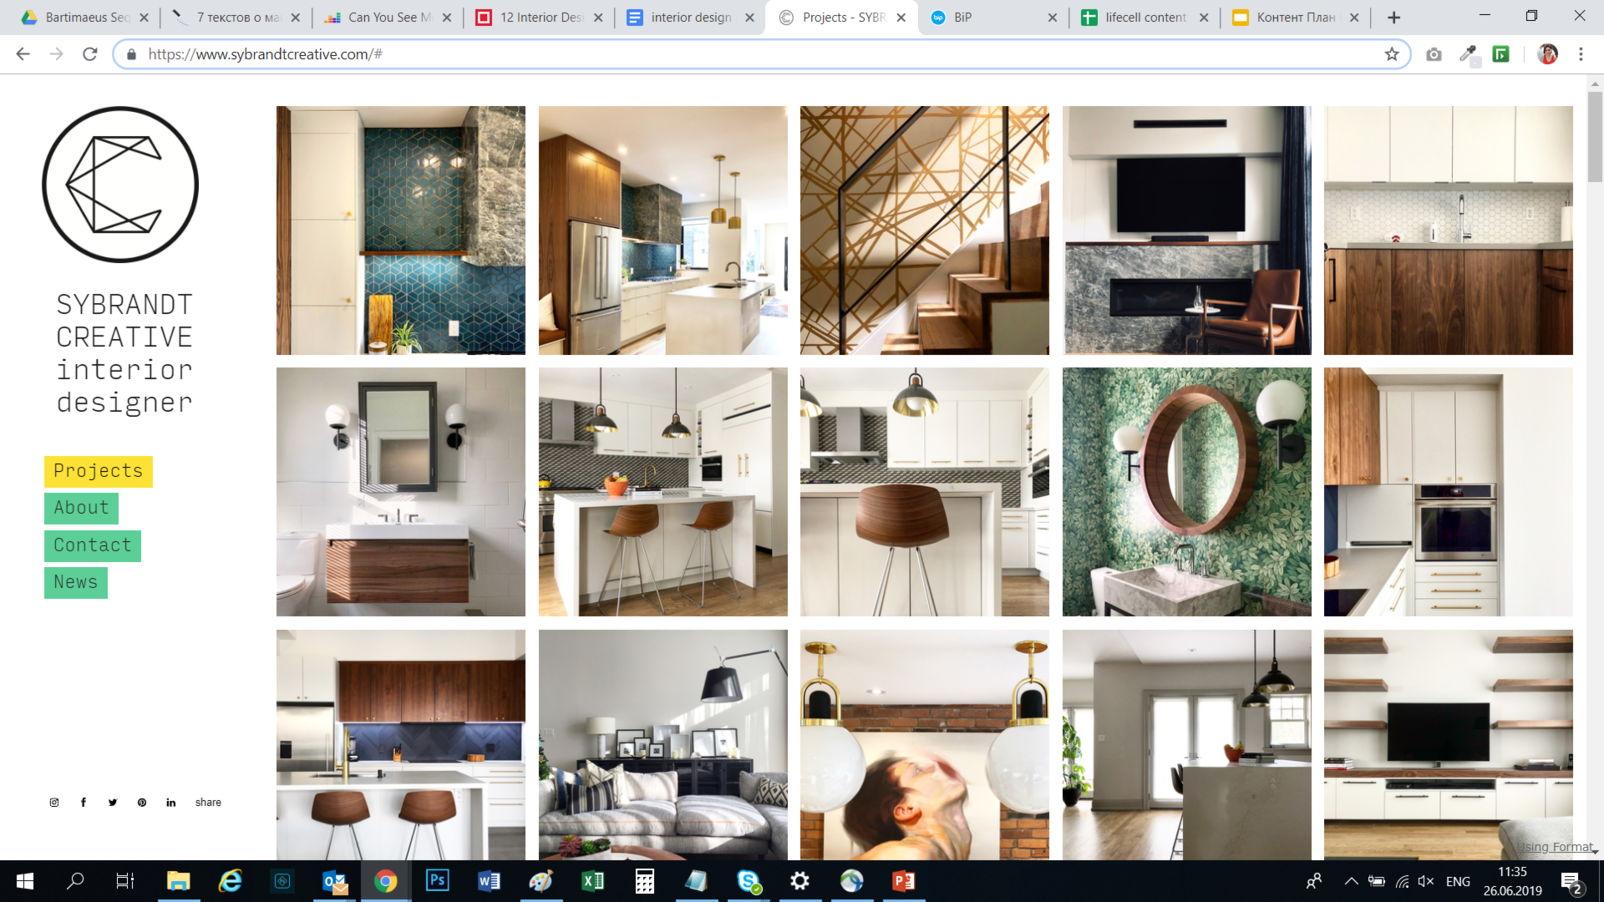 Sybrandt Creative interior designer website - weblium